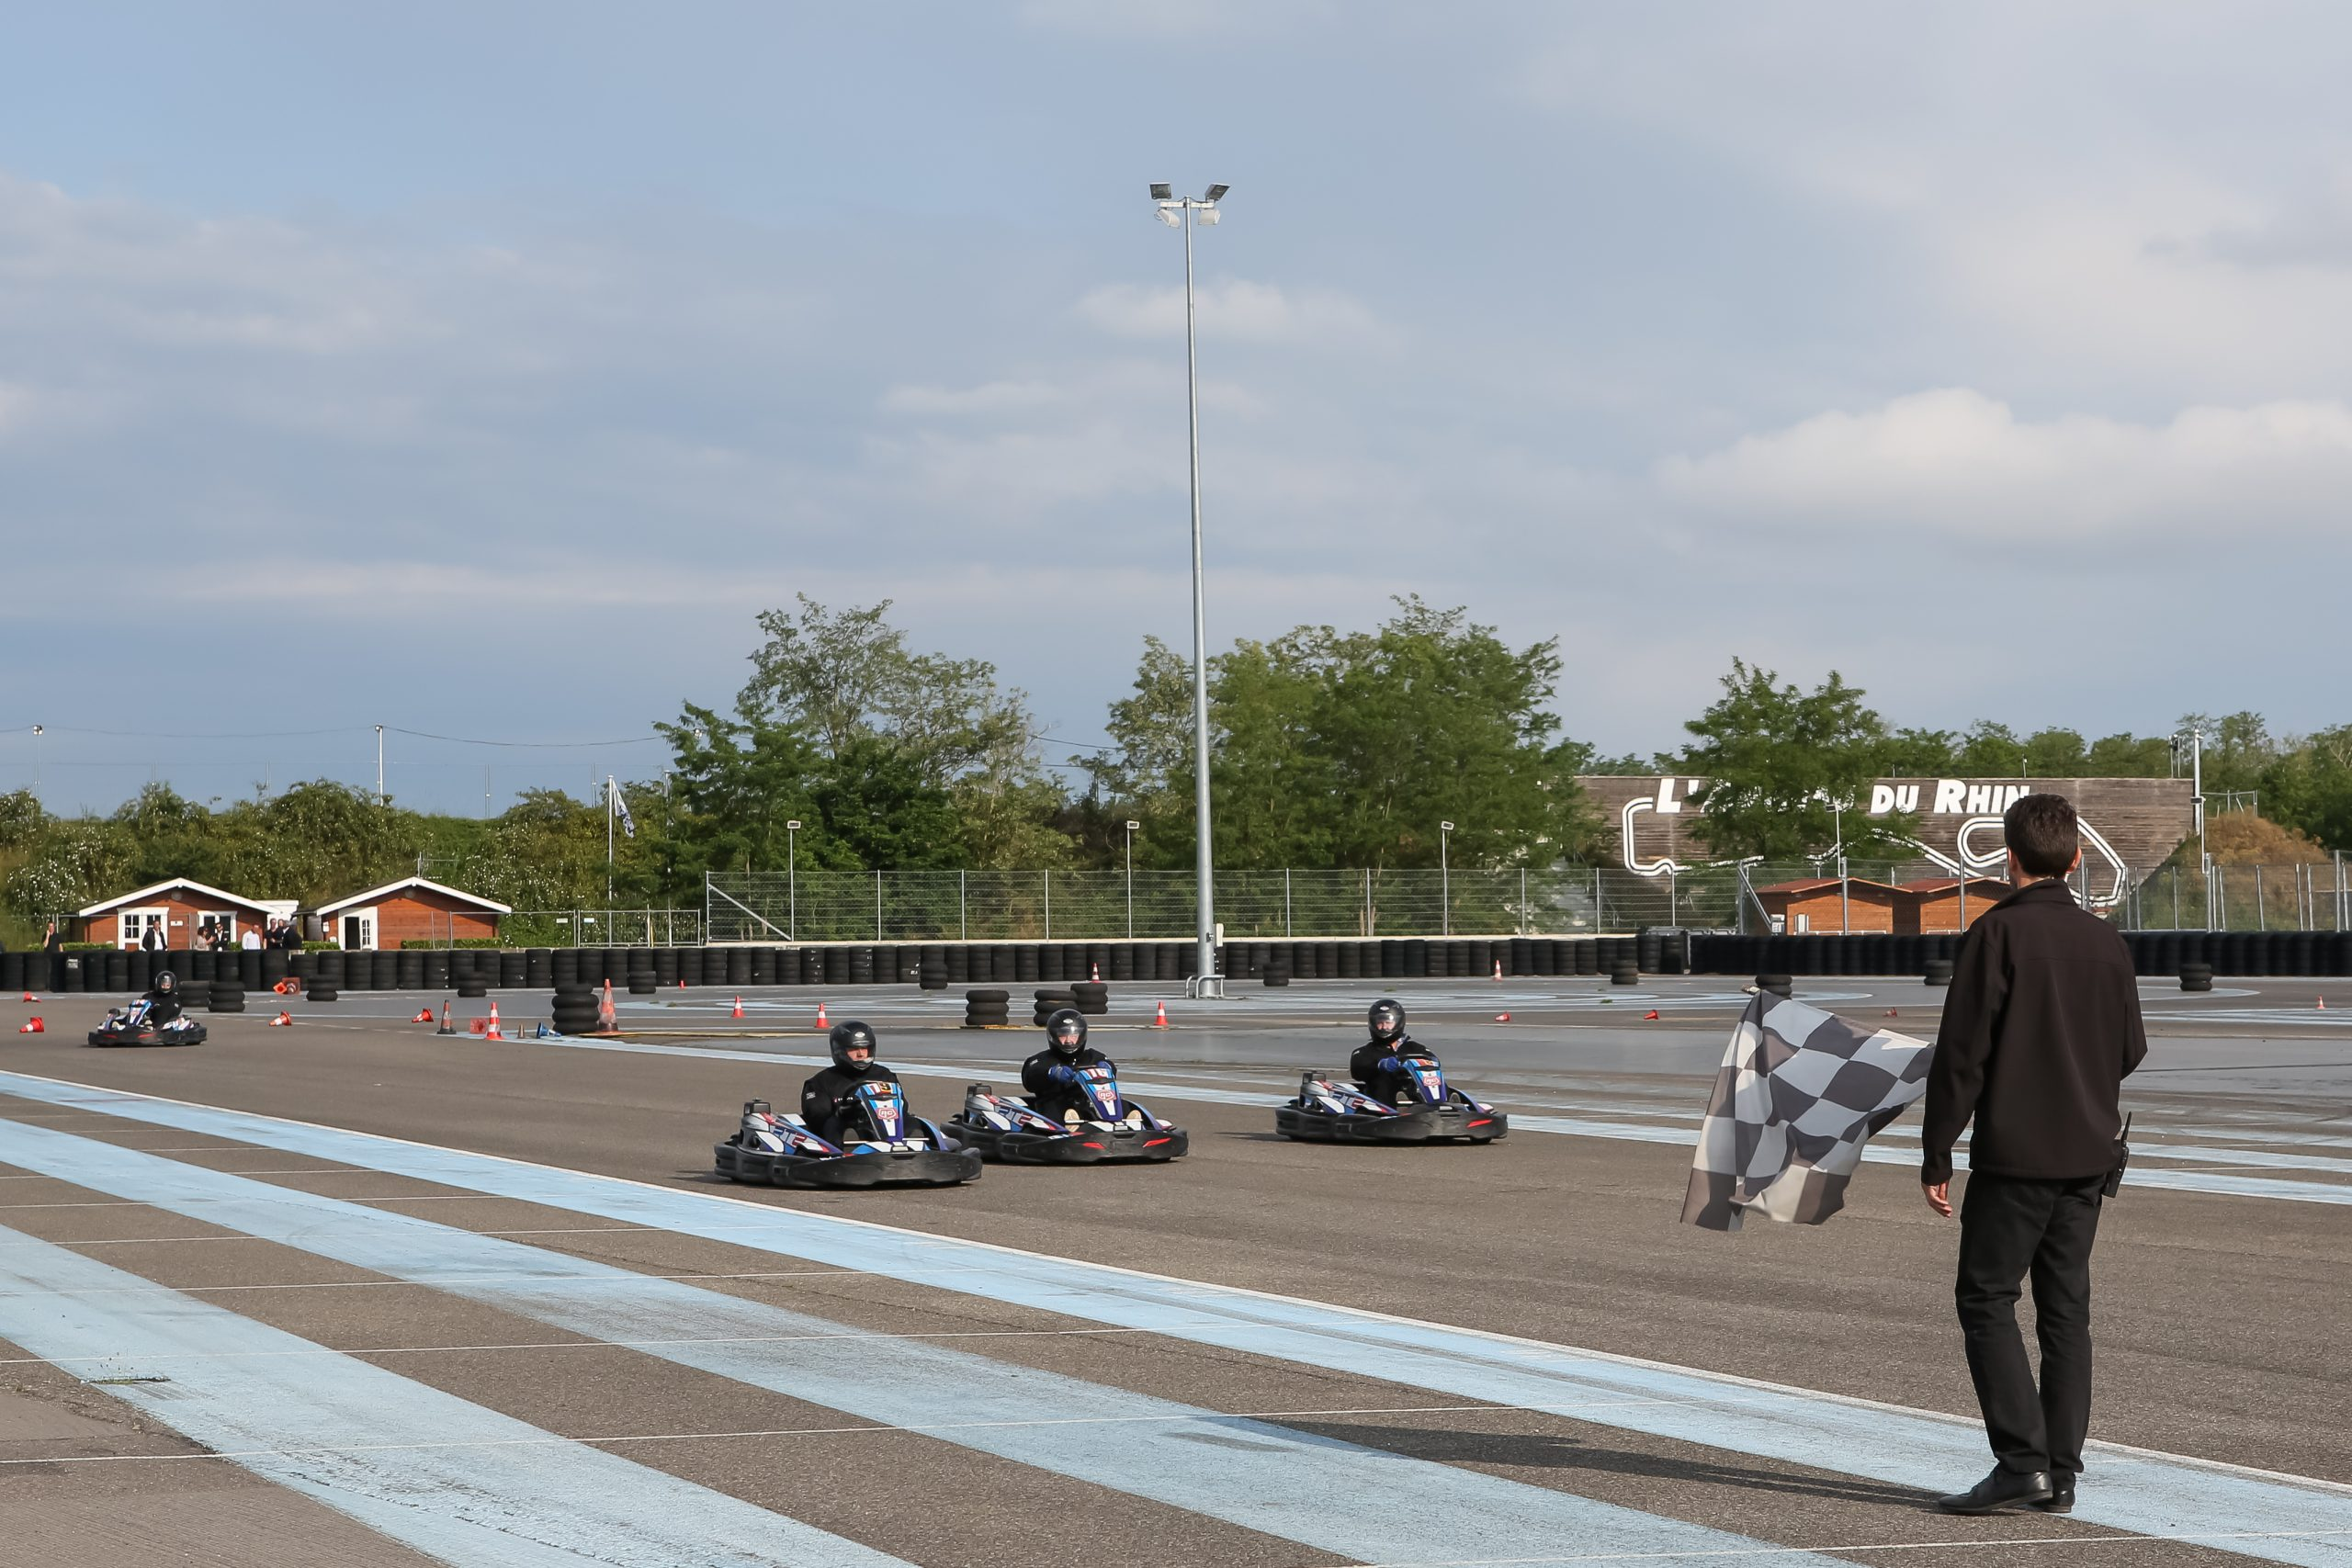 Sessions de karting Outdoor à l'Anneau du Rhin